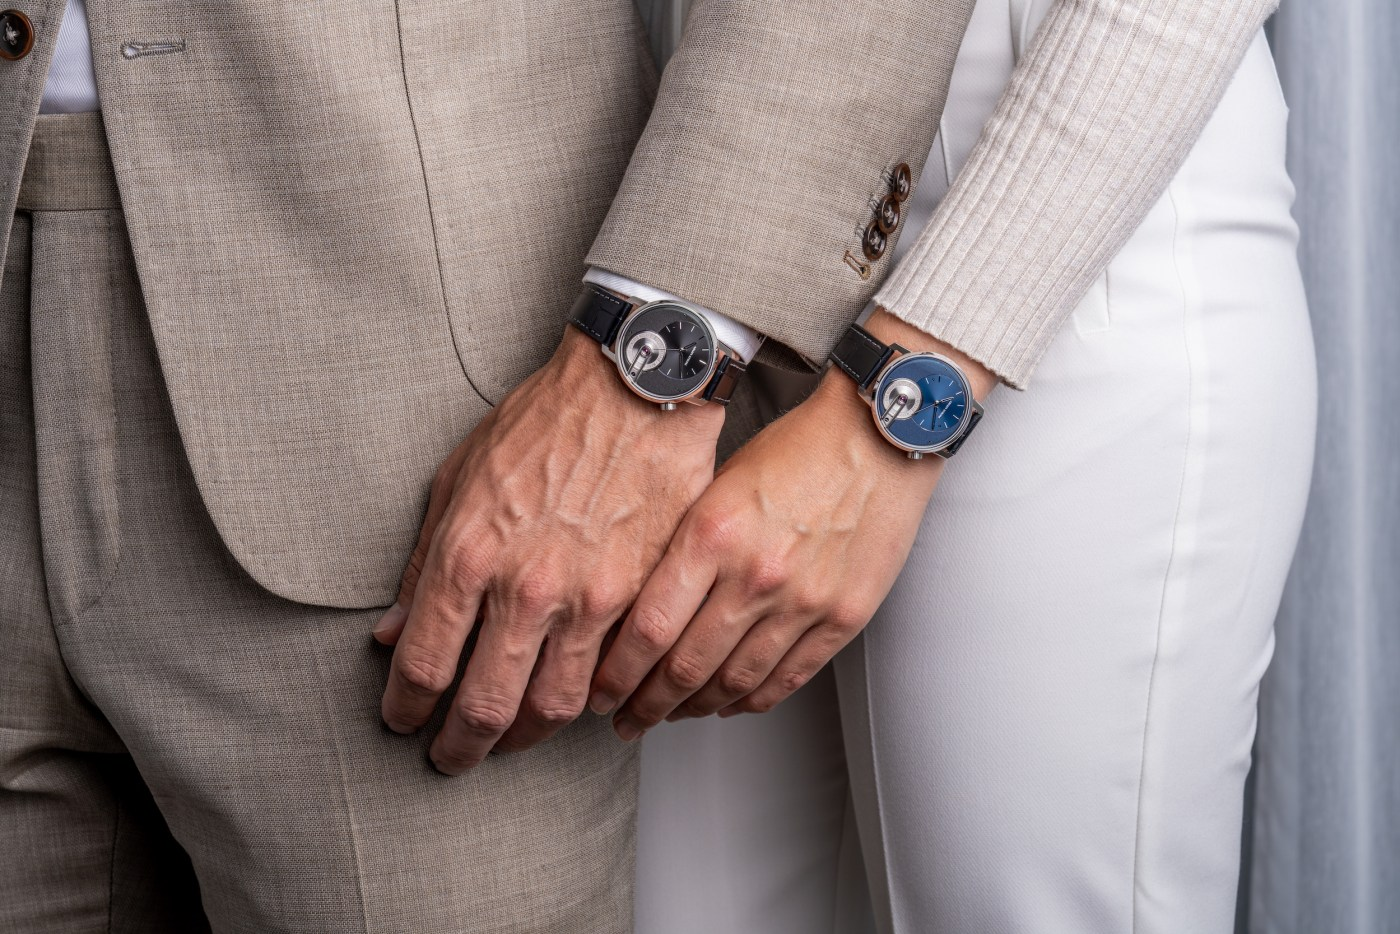 Armin Strom Tribute 1 Black or Blue wristshots